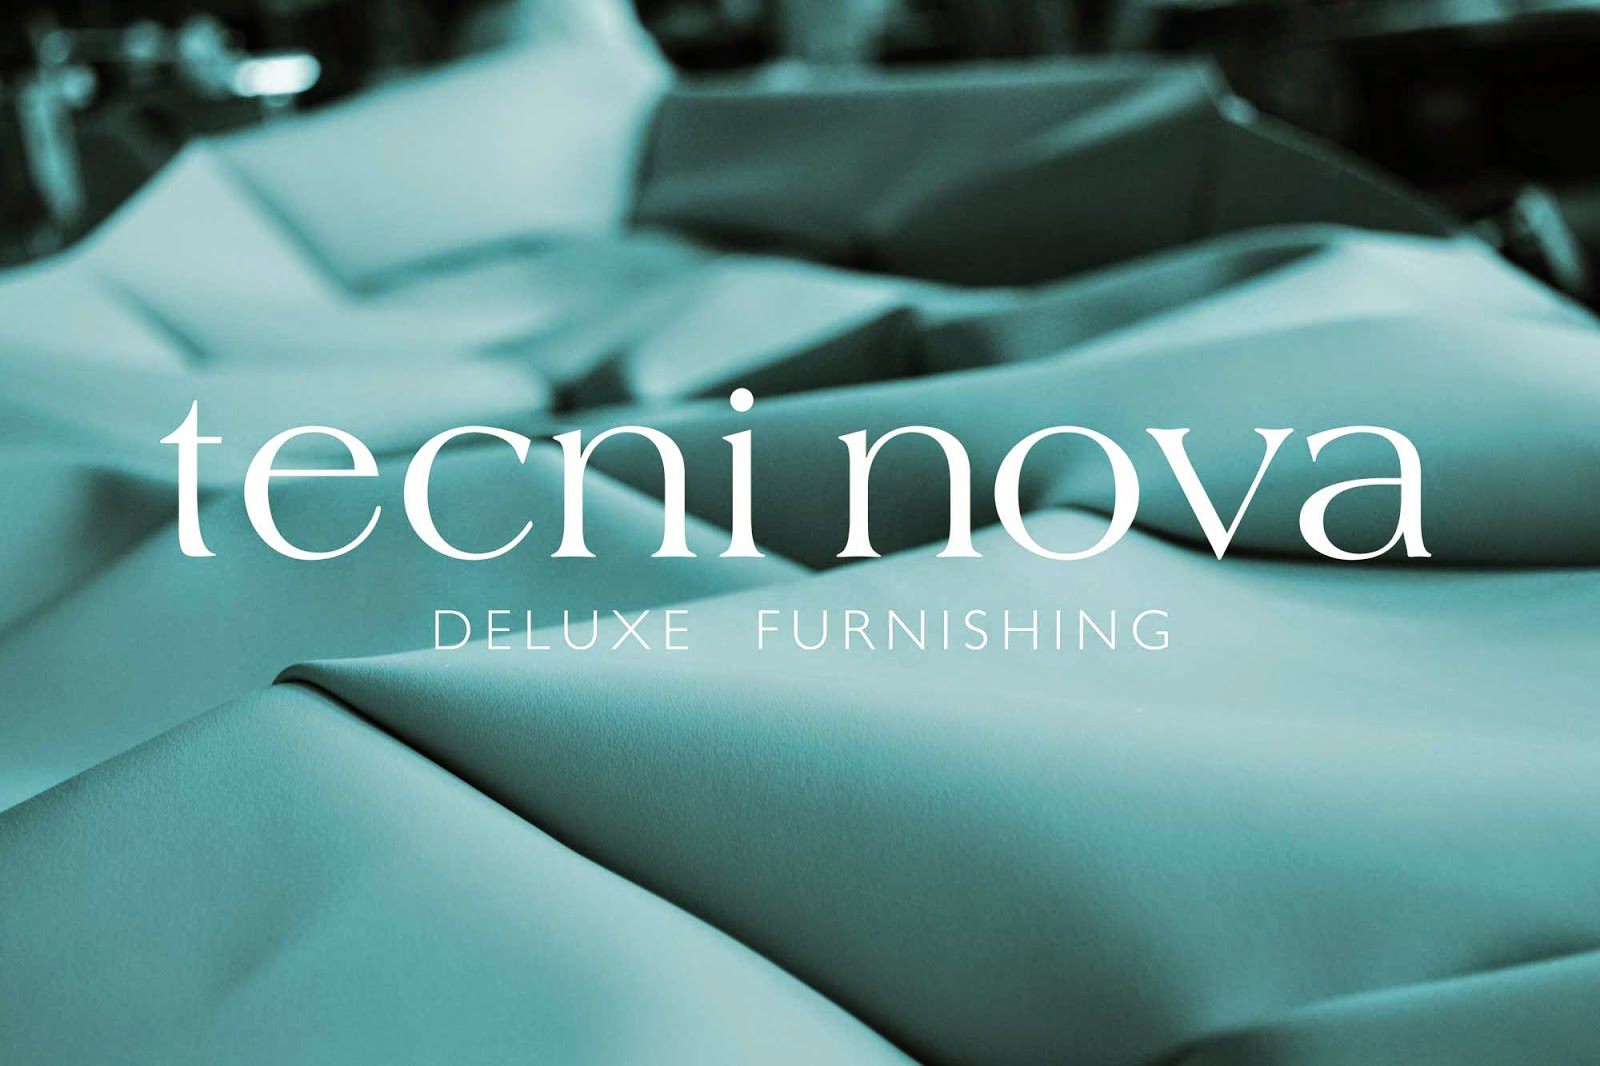 tecninova-nautic-village-thecooluxury-salon-nautico-barcelona-2014-deluxe-furnishing-upholstery-outdoor-furniture-upholstery-luxury-lifestile-yath-sailing-shoot-decoracion-lujo-muebles-exterior-terraza-yate-design-luxurious-sofa-armchair-art-design-beauty-business-fashion-gourmet-lifestyle-technology-thecooluxuryxtecninova-nauticvillage14